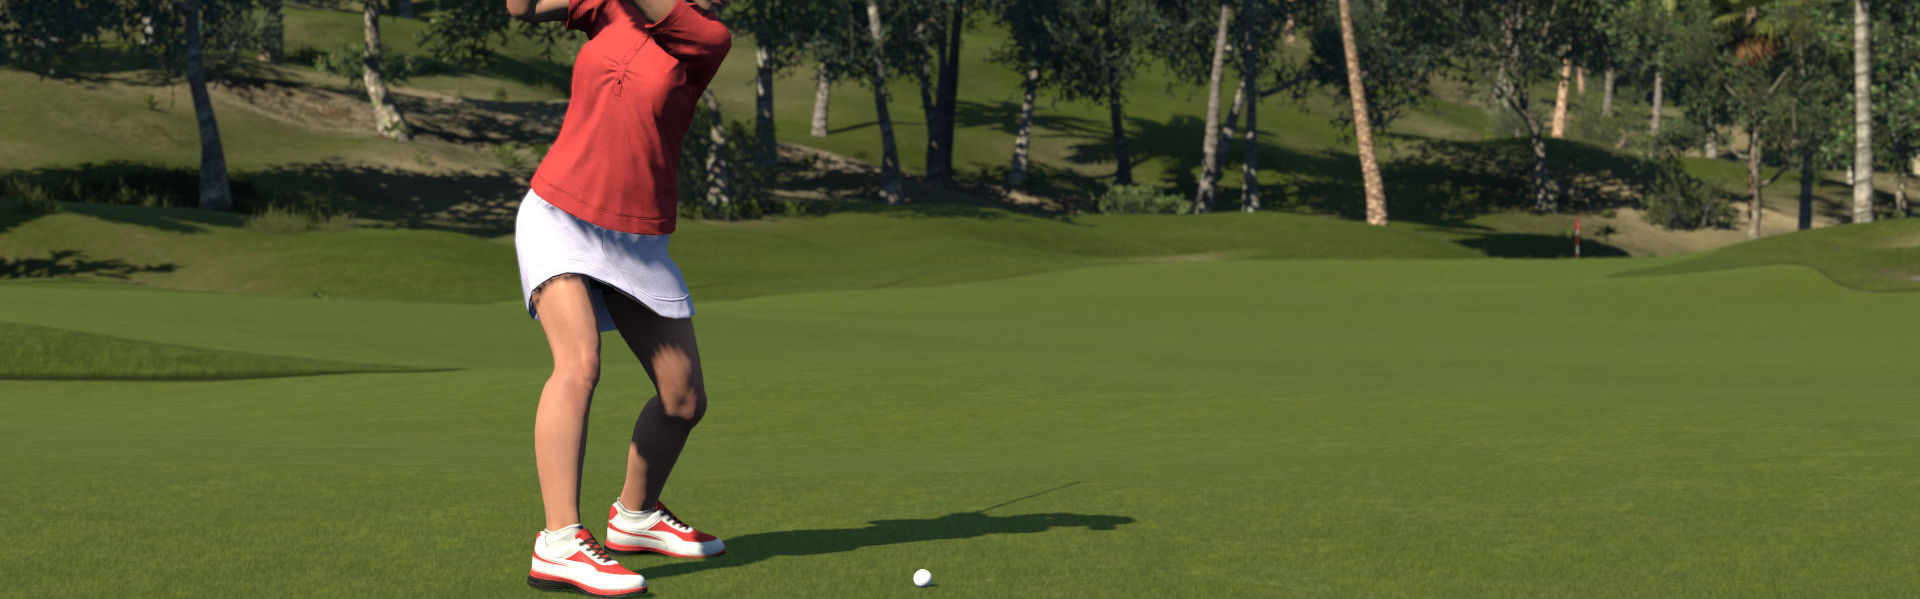 The Golf Club Collector's Edition Bundle Steam Key GLOBAL